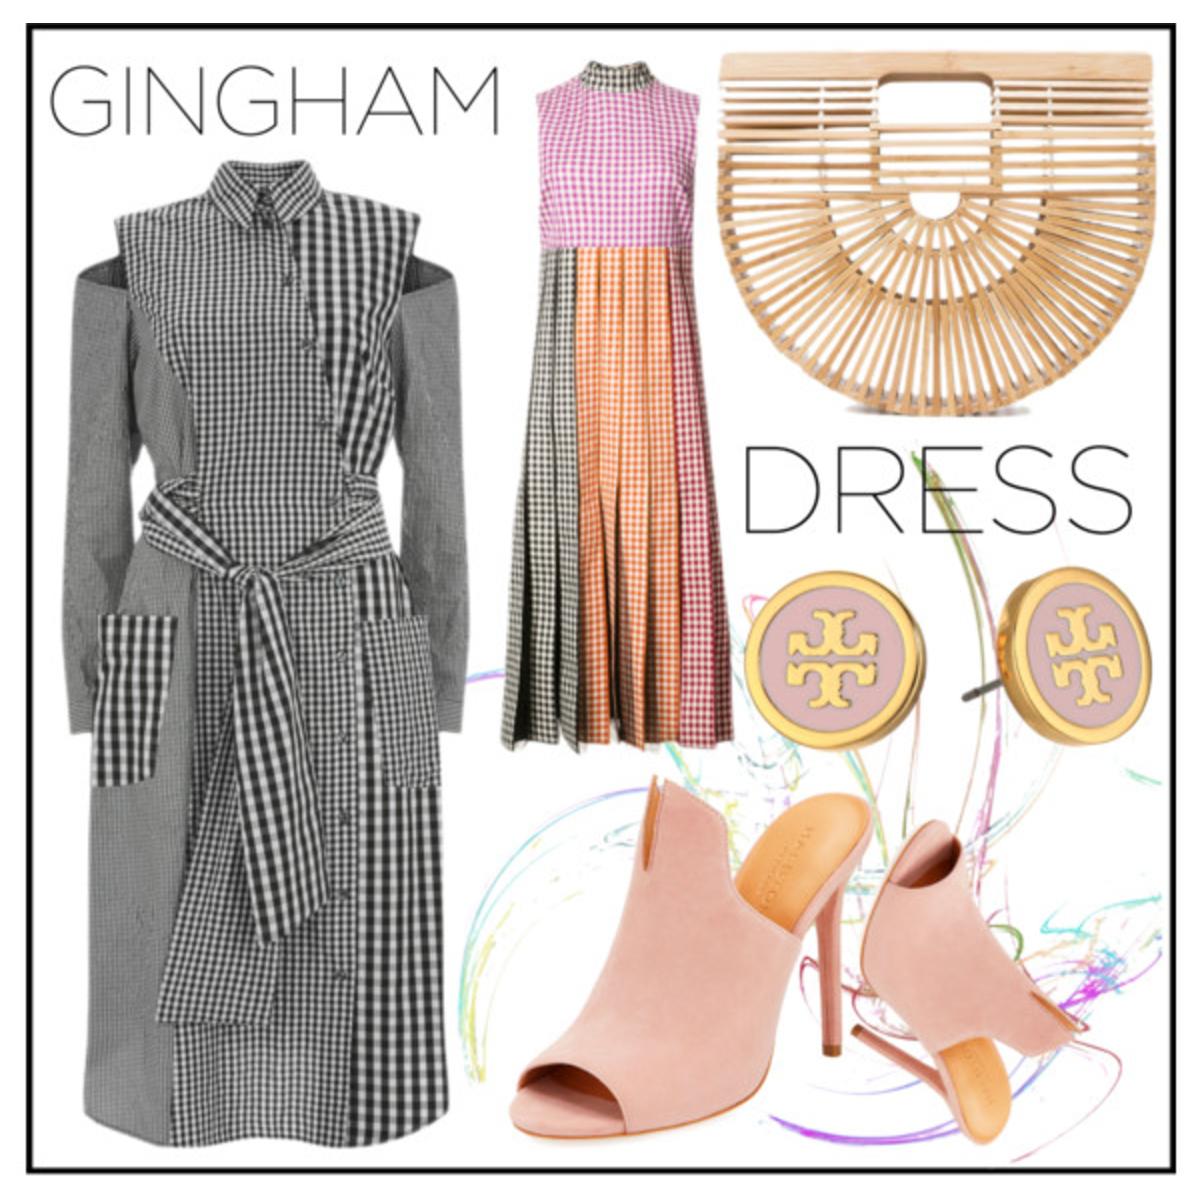 Gingham Trend - Dresses